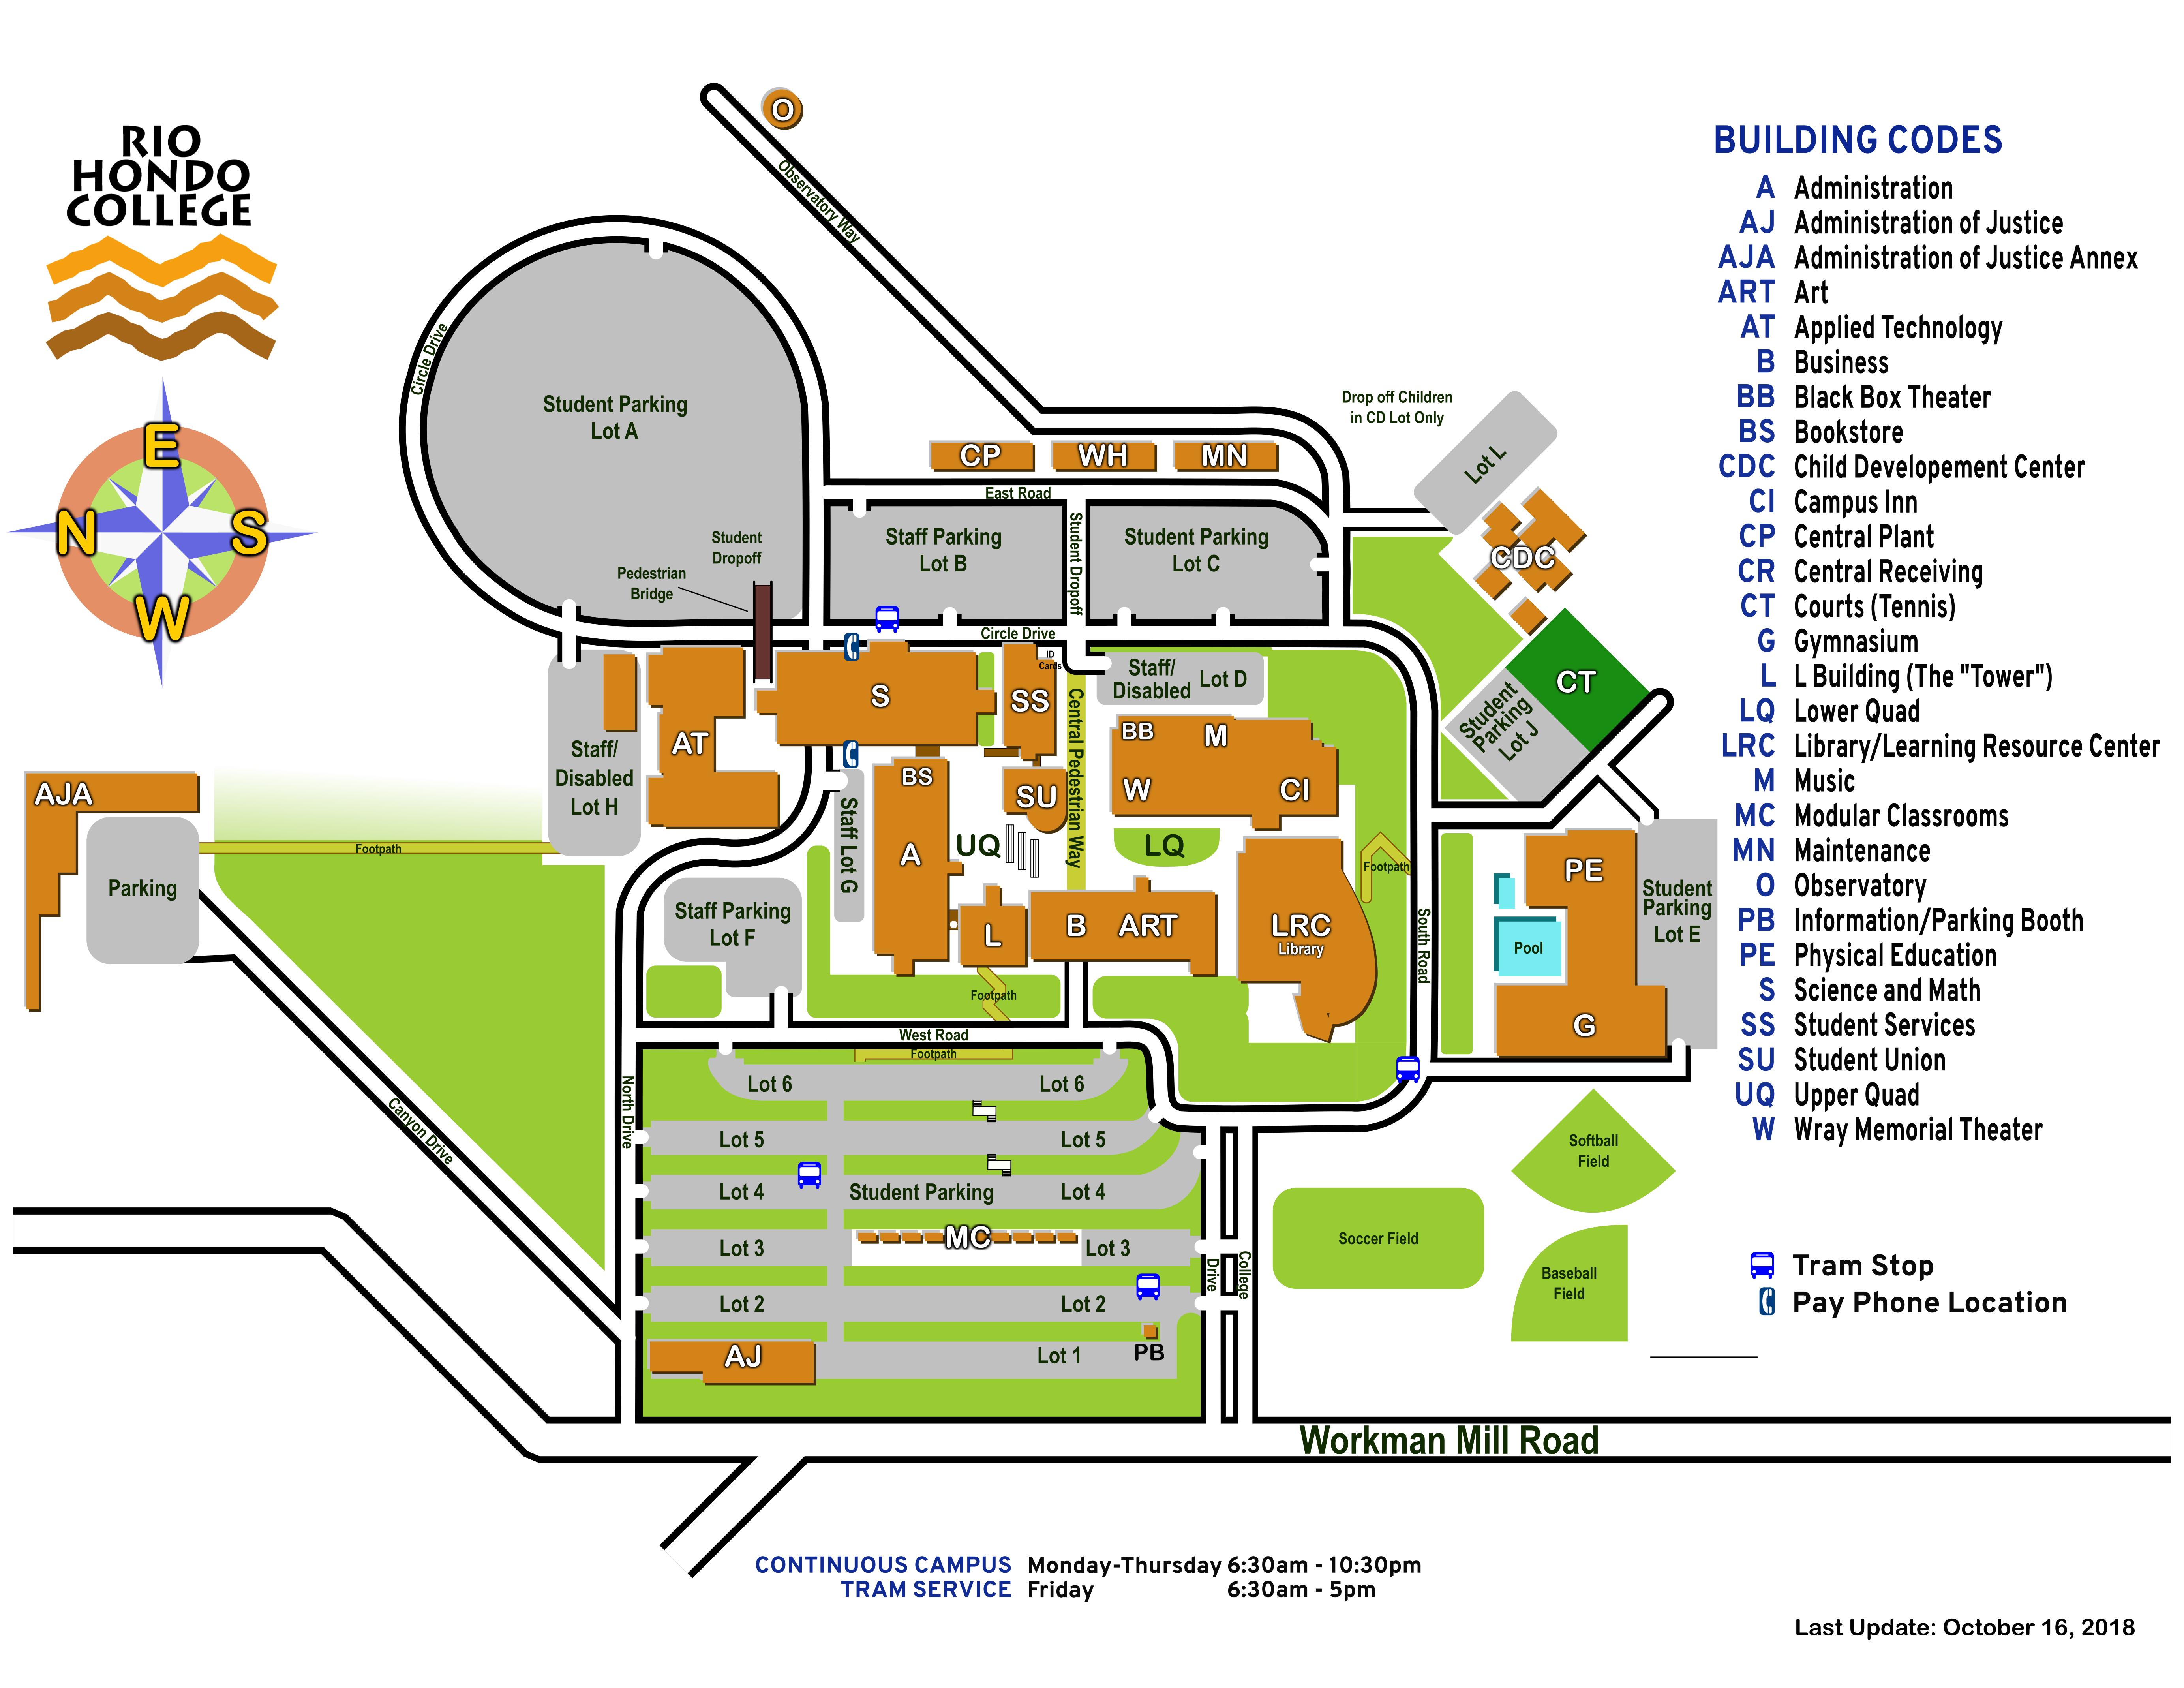 Map of Rio Hondo College